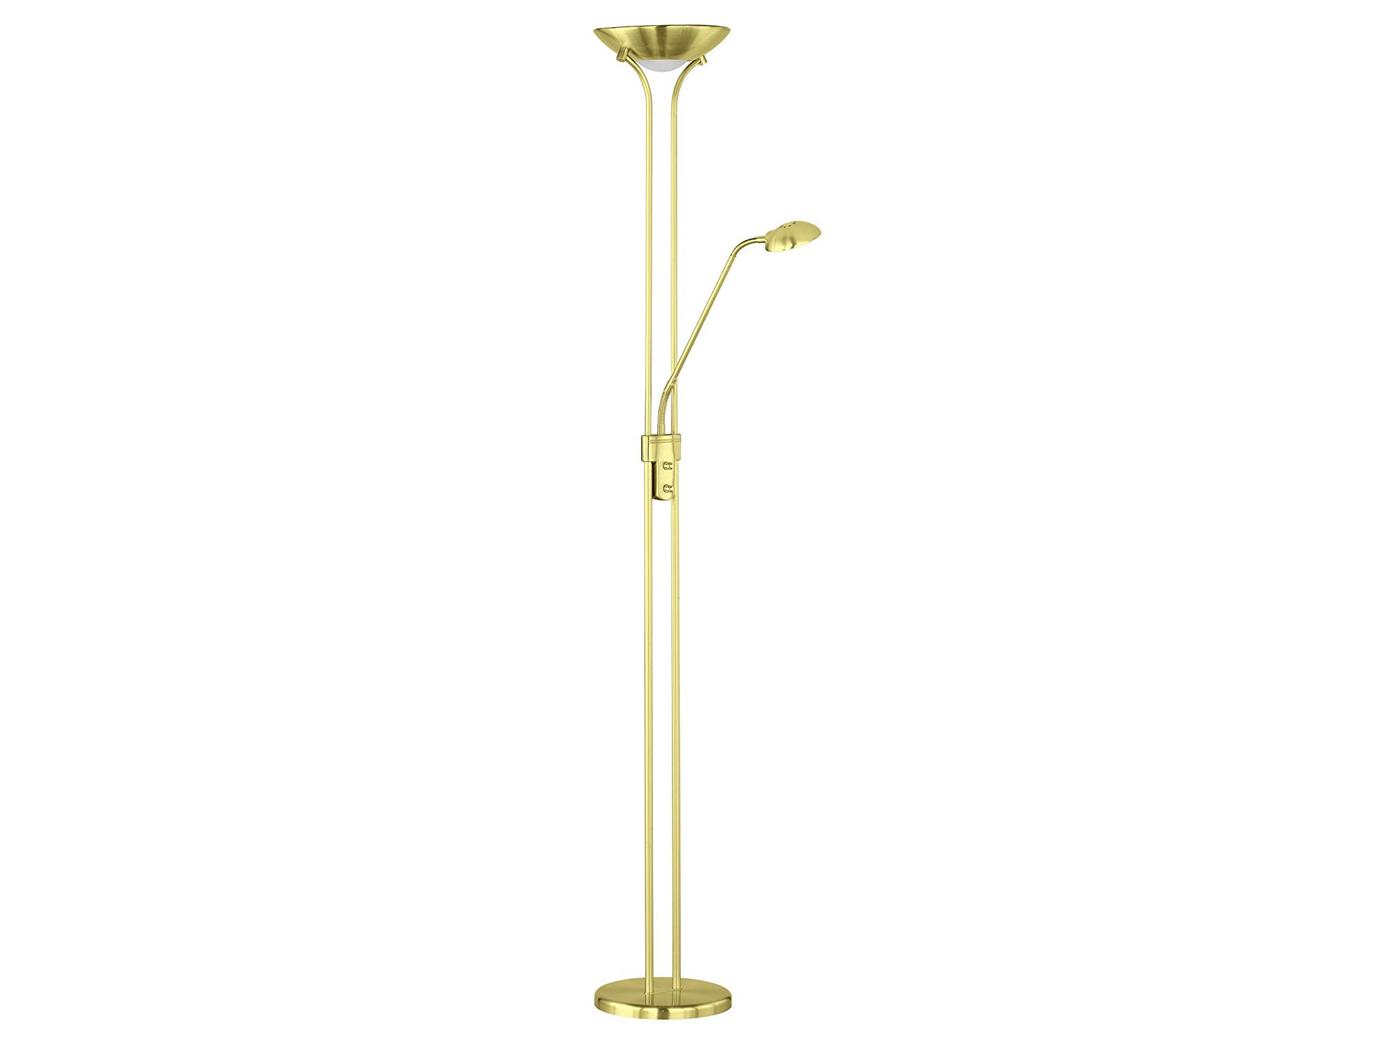 Full Size of Stehlampen Wohnzimmer Stehlampe Schlafzimmer Wohnzimmer Stehlampe Dimmbar